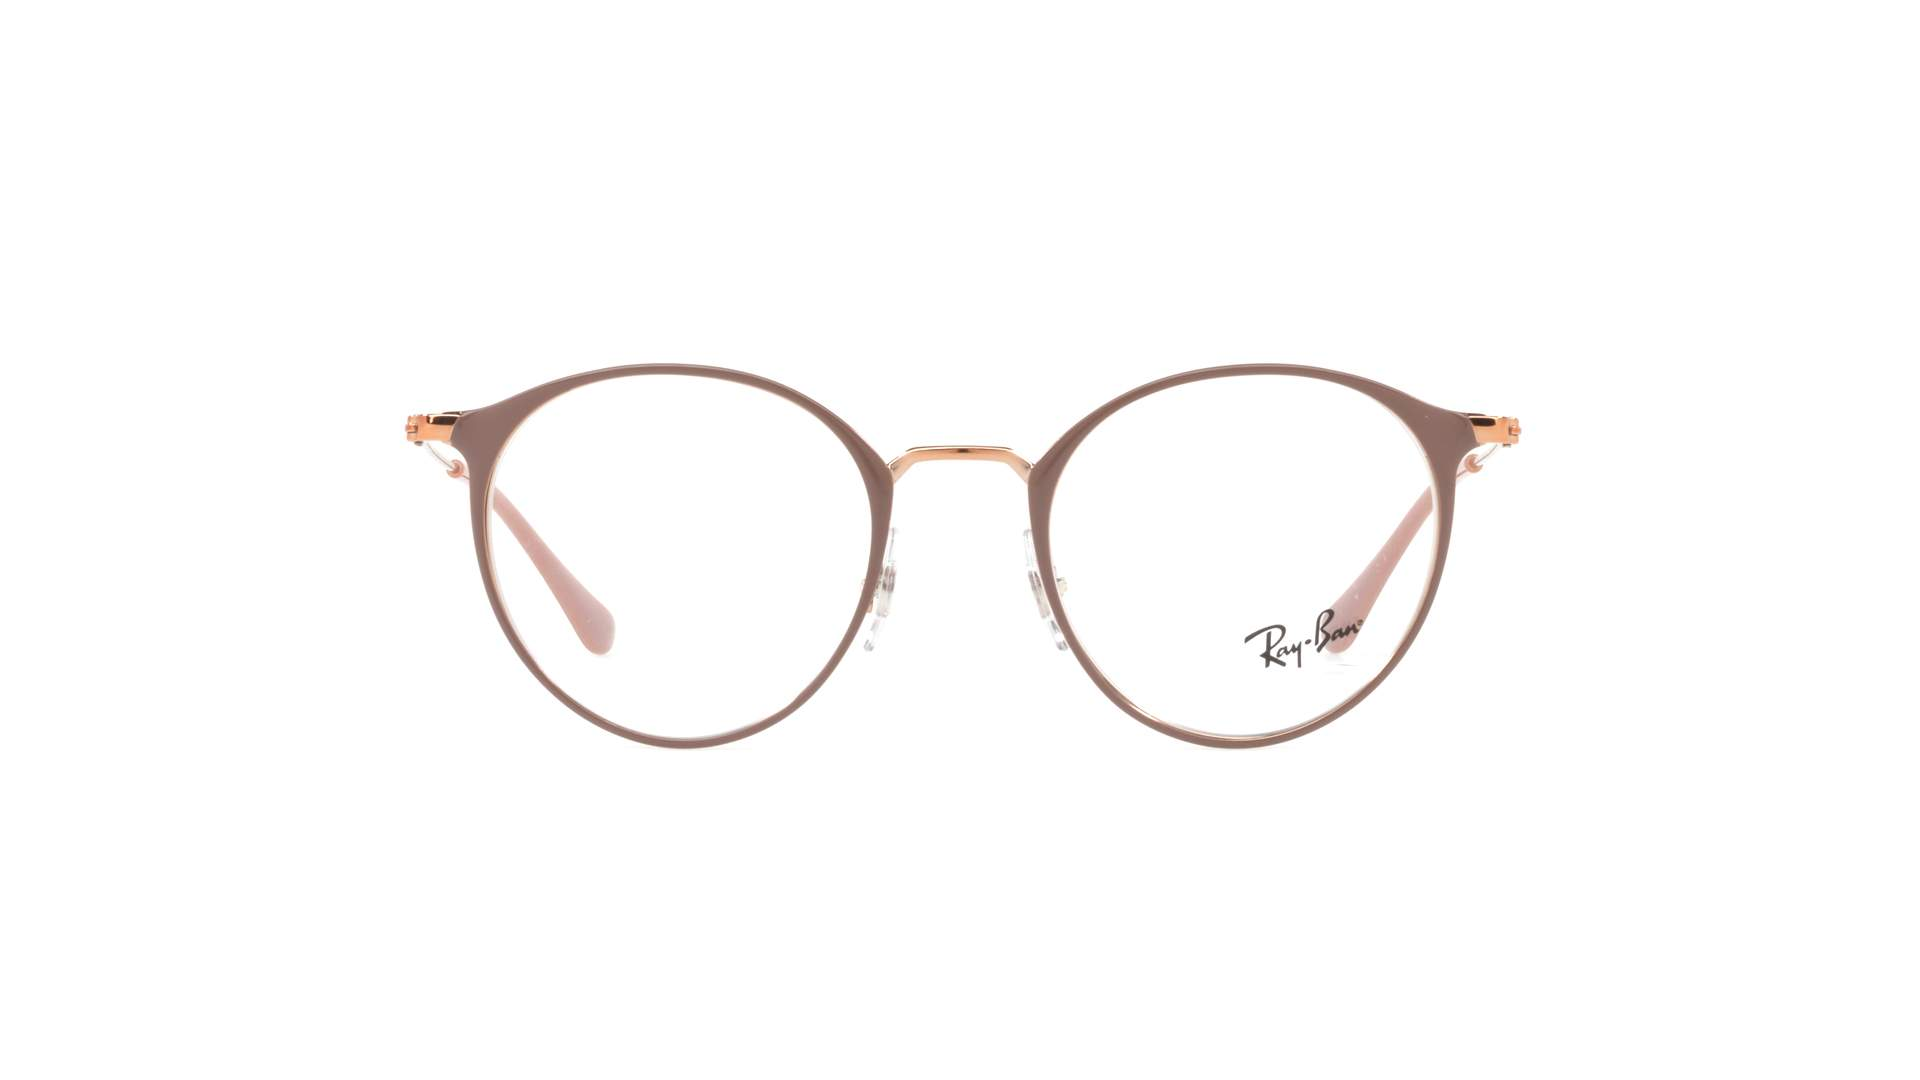 41ff88e7177 Eyeglasses Ray-Ban RX6378 RB6378 2973 47-21 Pink Small